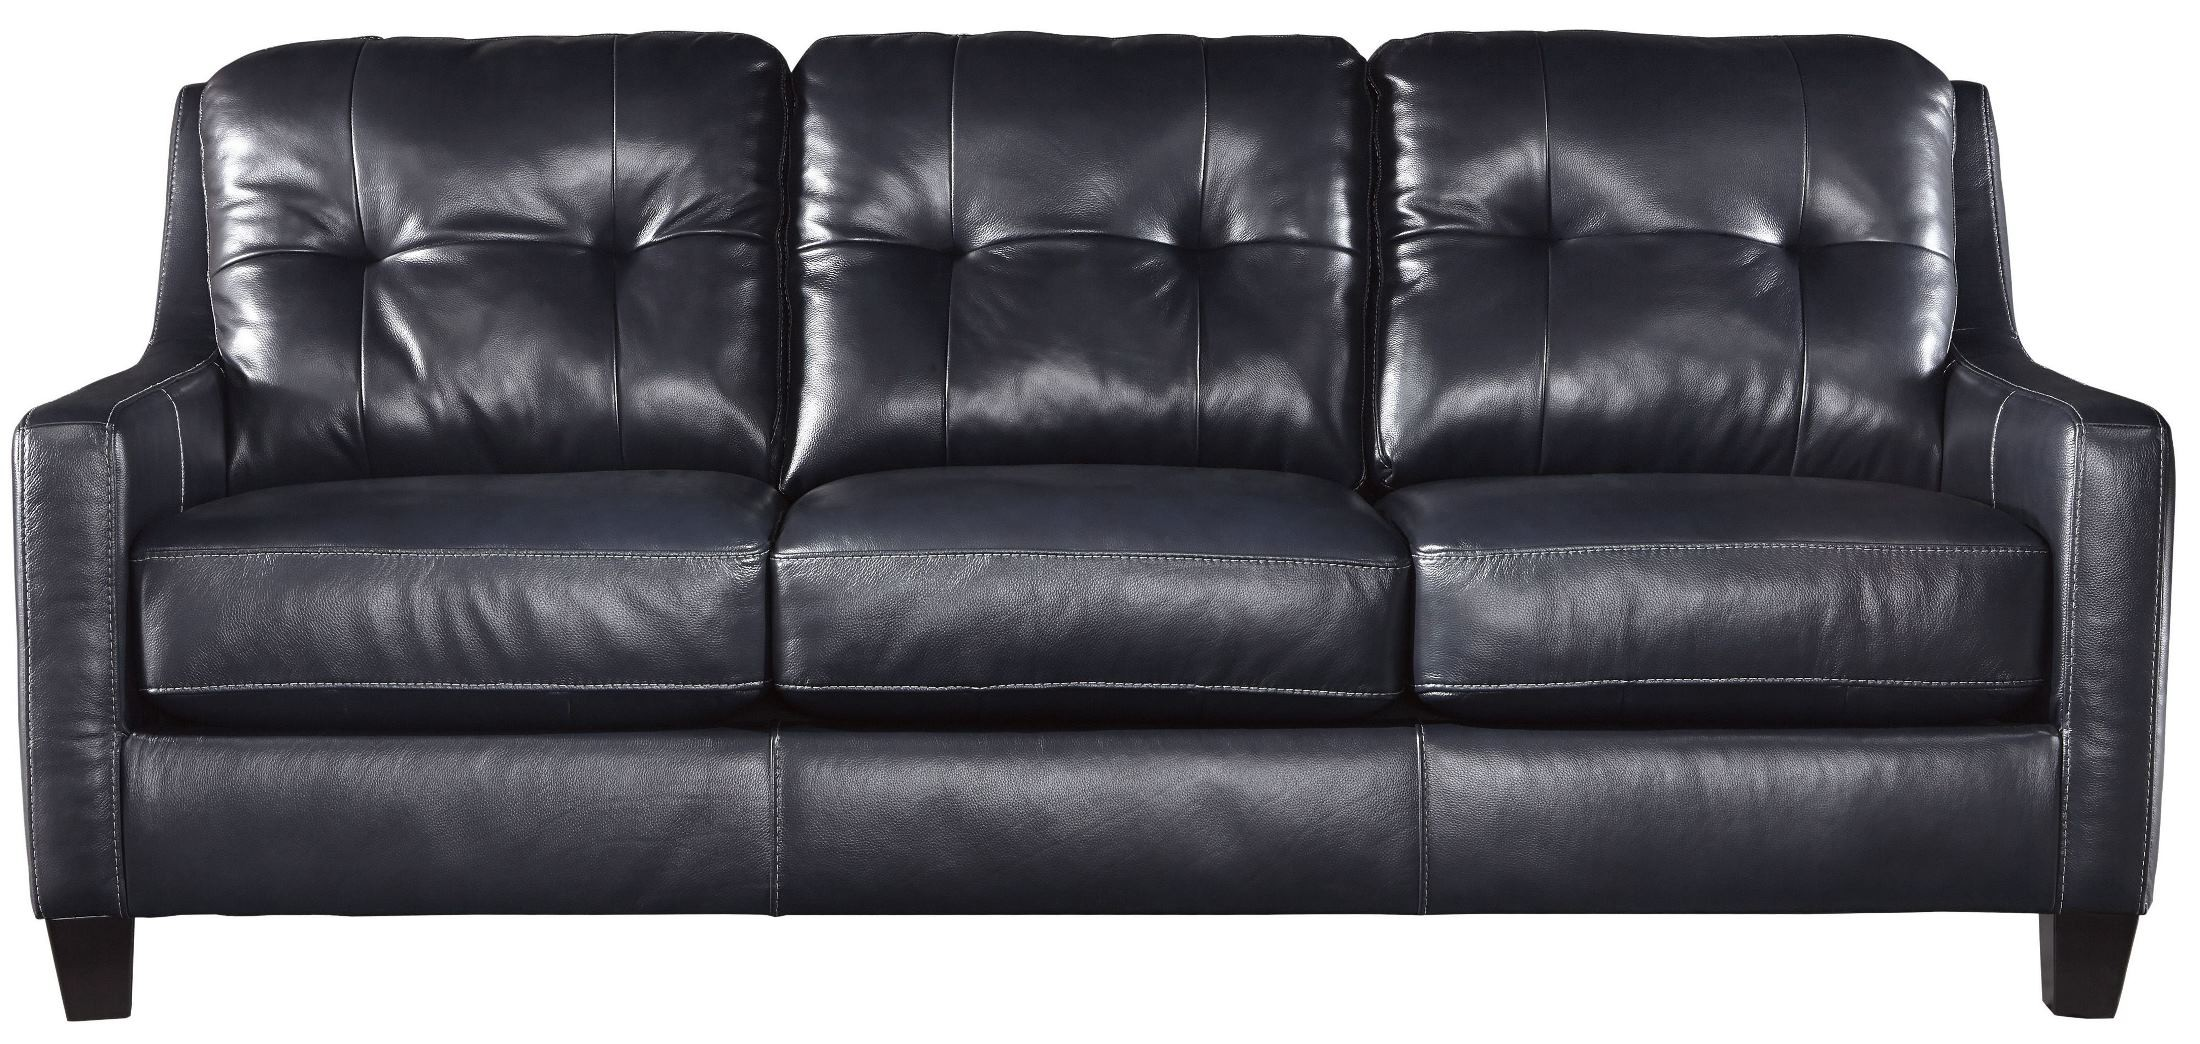 O Kean Navy Queen Sofa Sleeper From Ashley Coleman Furniture